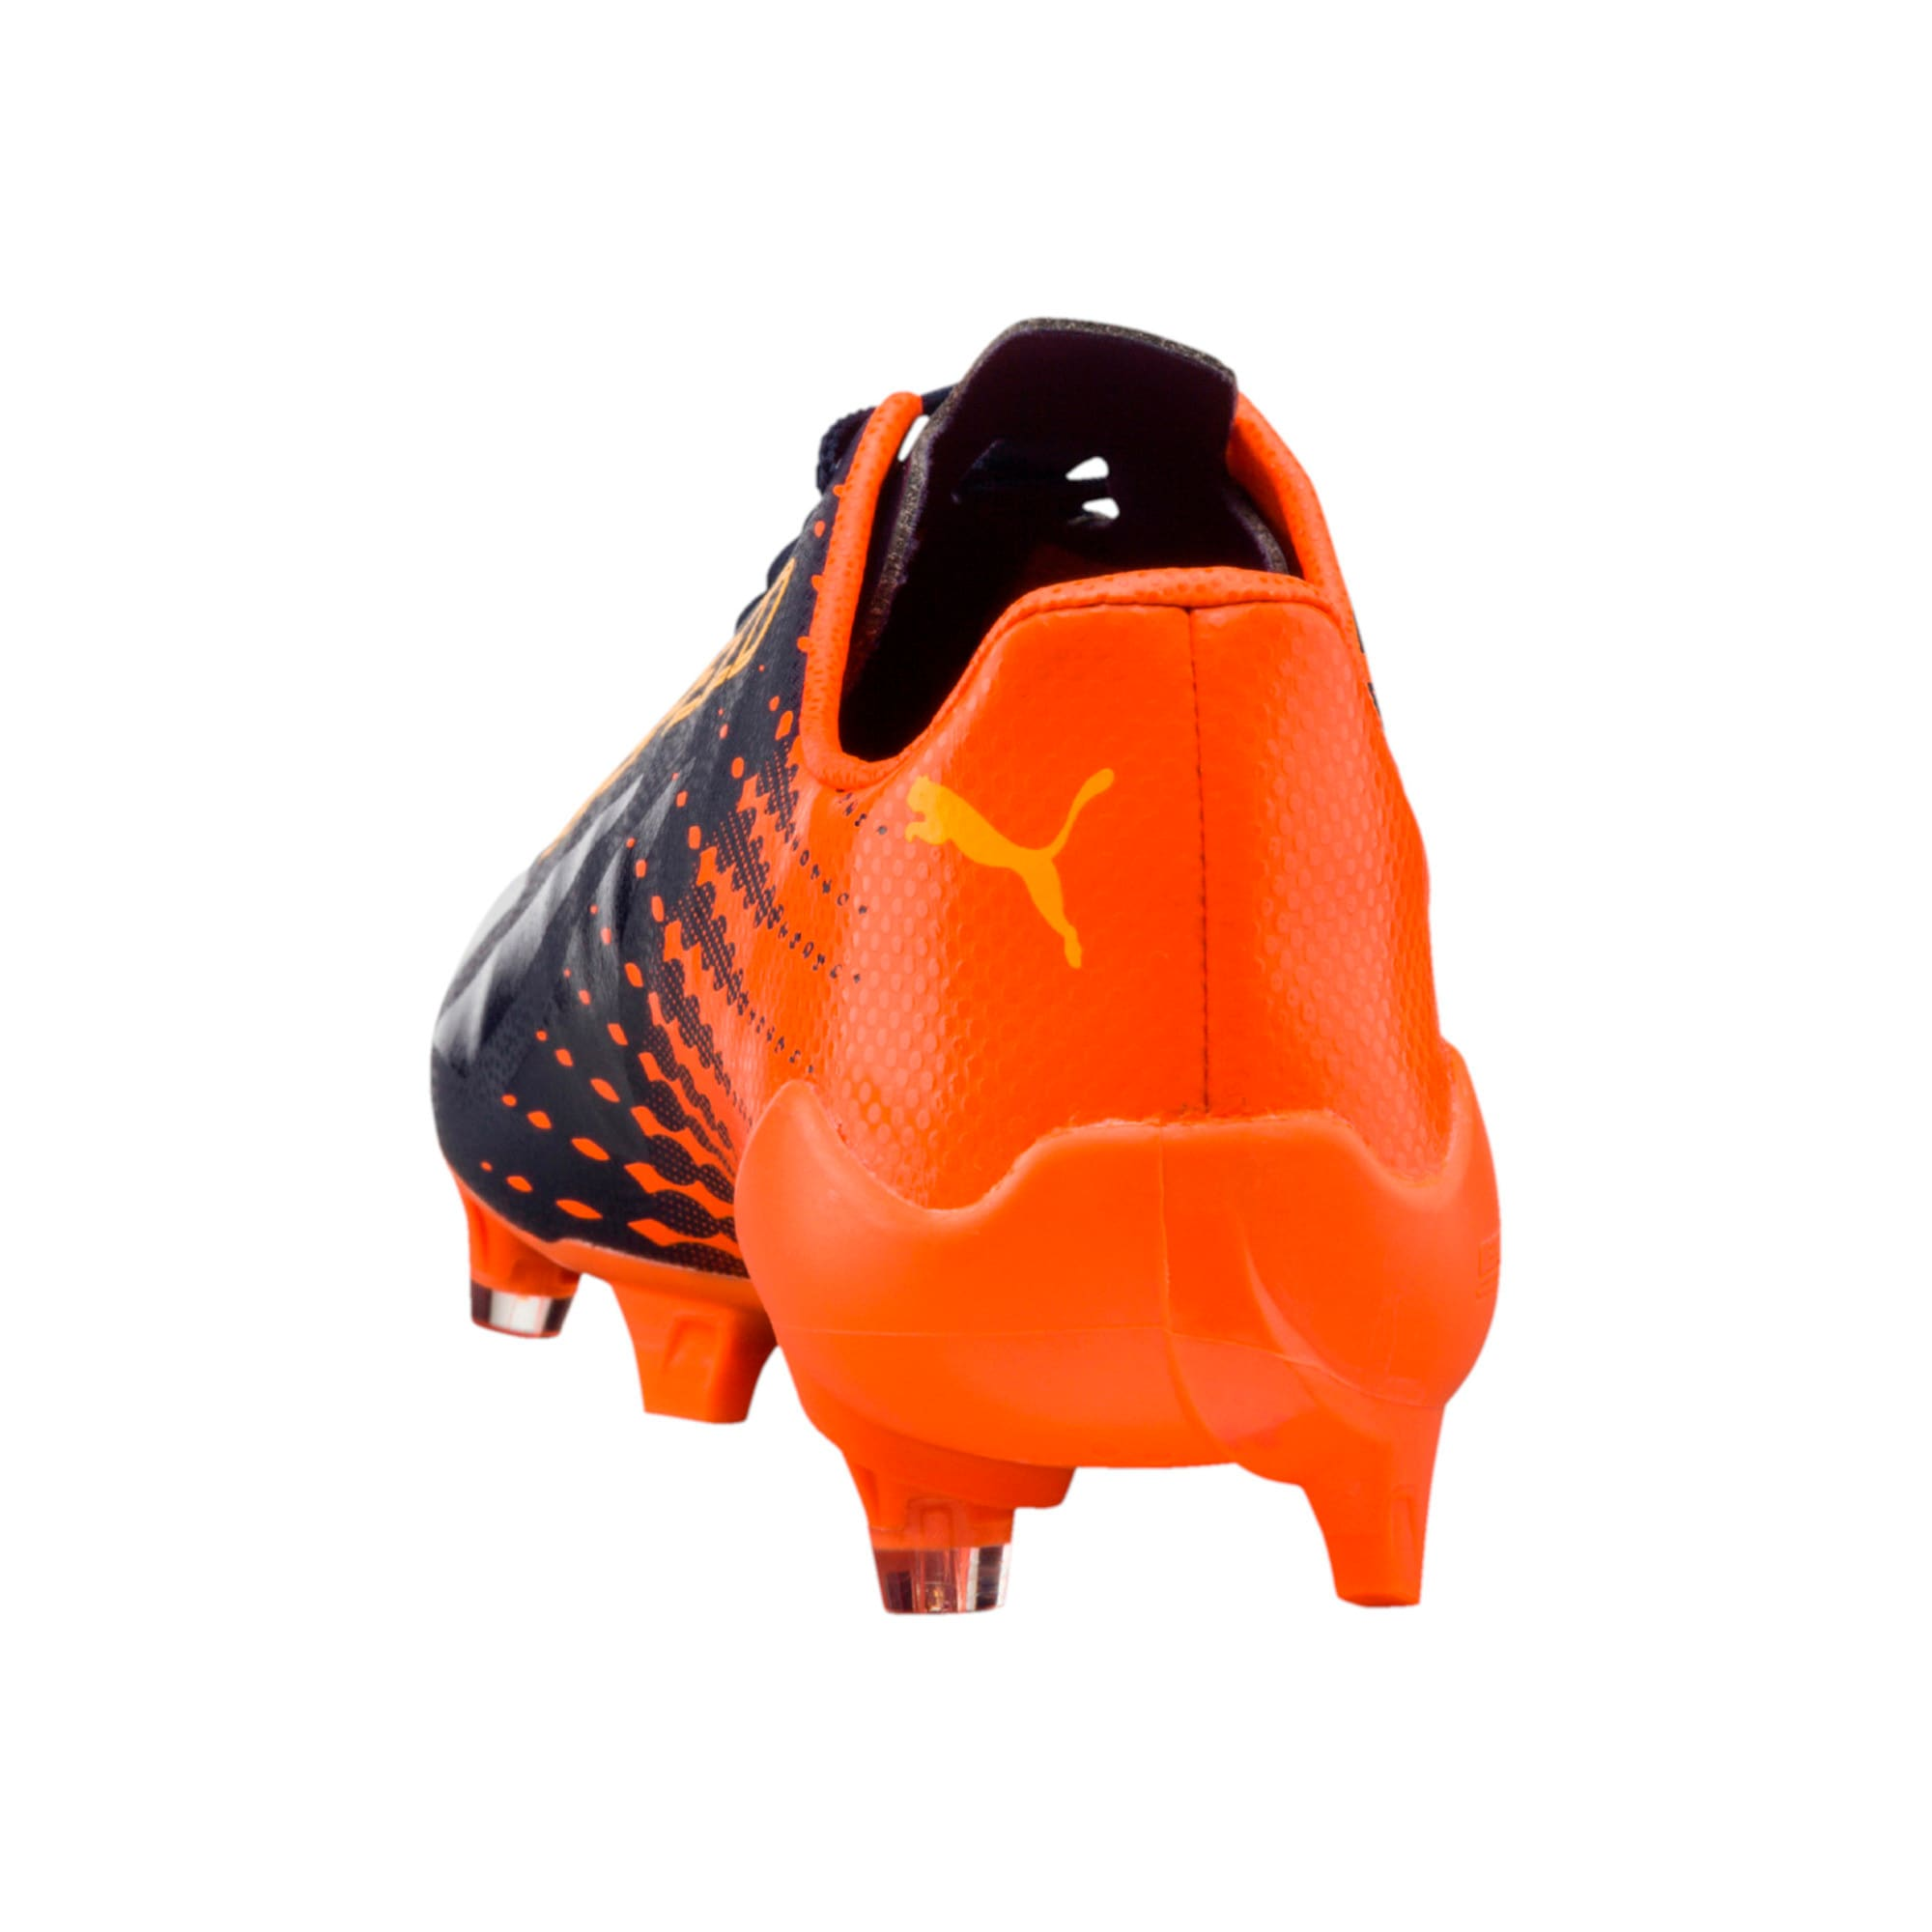 Thumbnail 8 of evoSPEED 17 SL-S FG Men's Football Boots, YELLOW-Peacoat-Orange, medium-IND